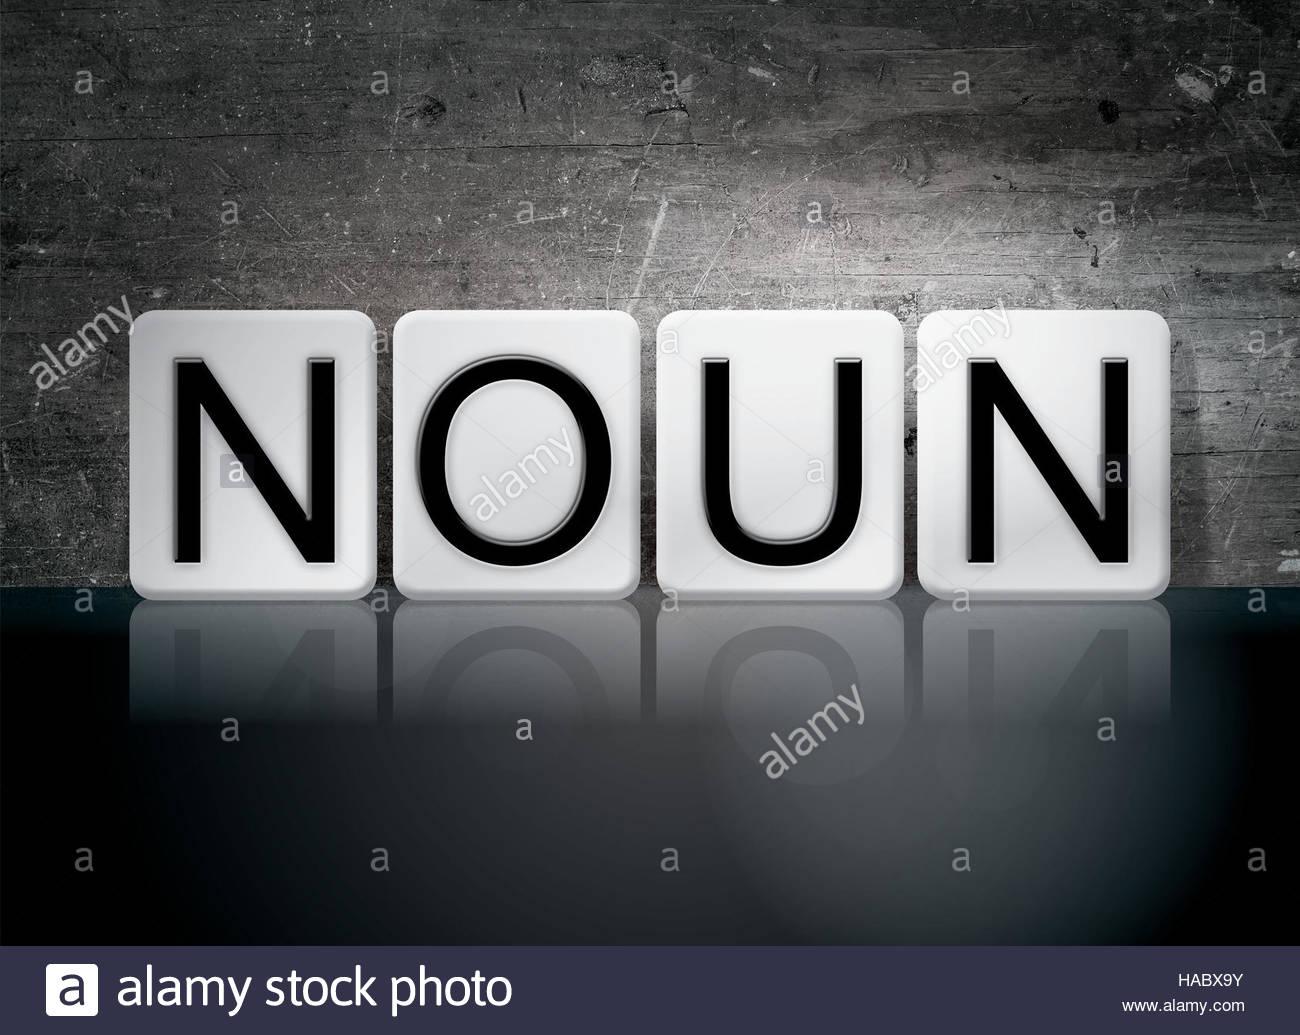 The word Noun written in white tiles against a dark vintage 1300x1035